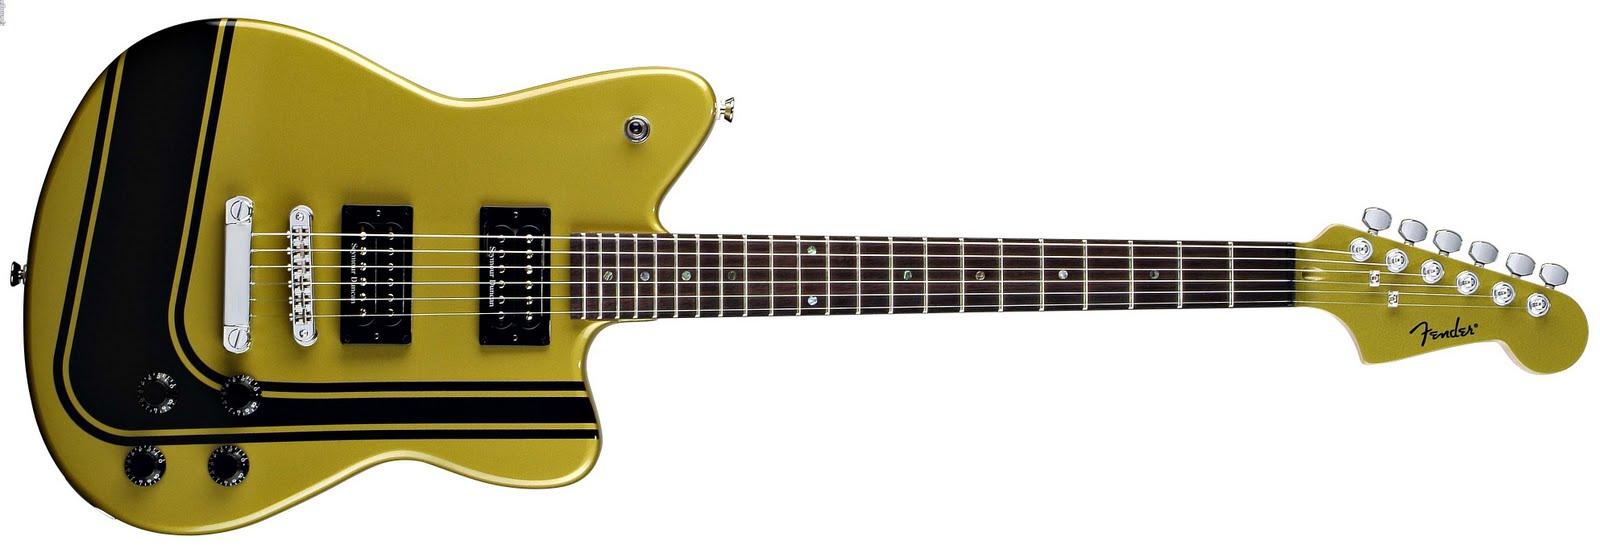 The Offset Guitar Superthread Ultimate Fender Toronado Wiring Diagram